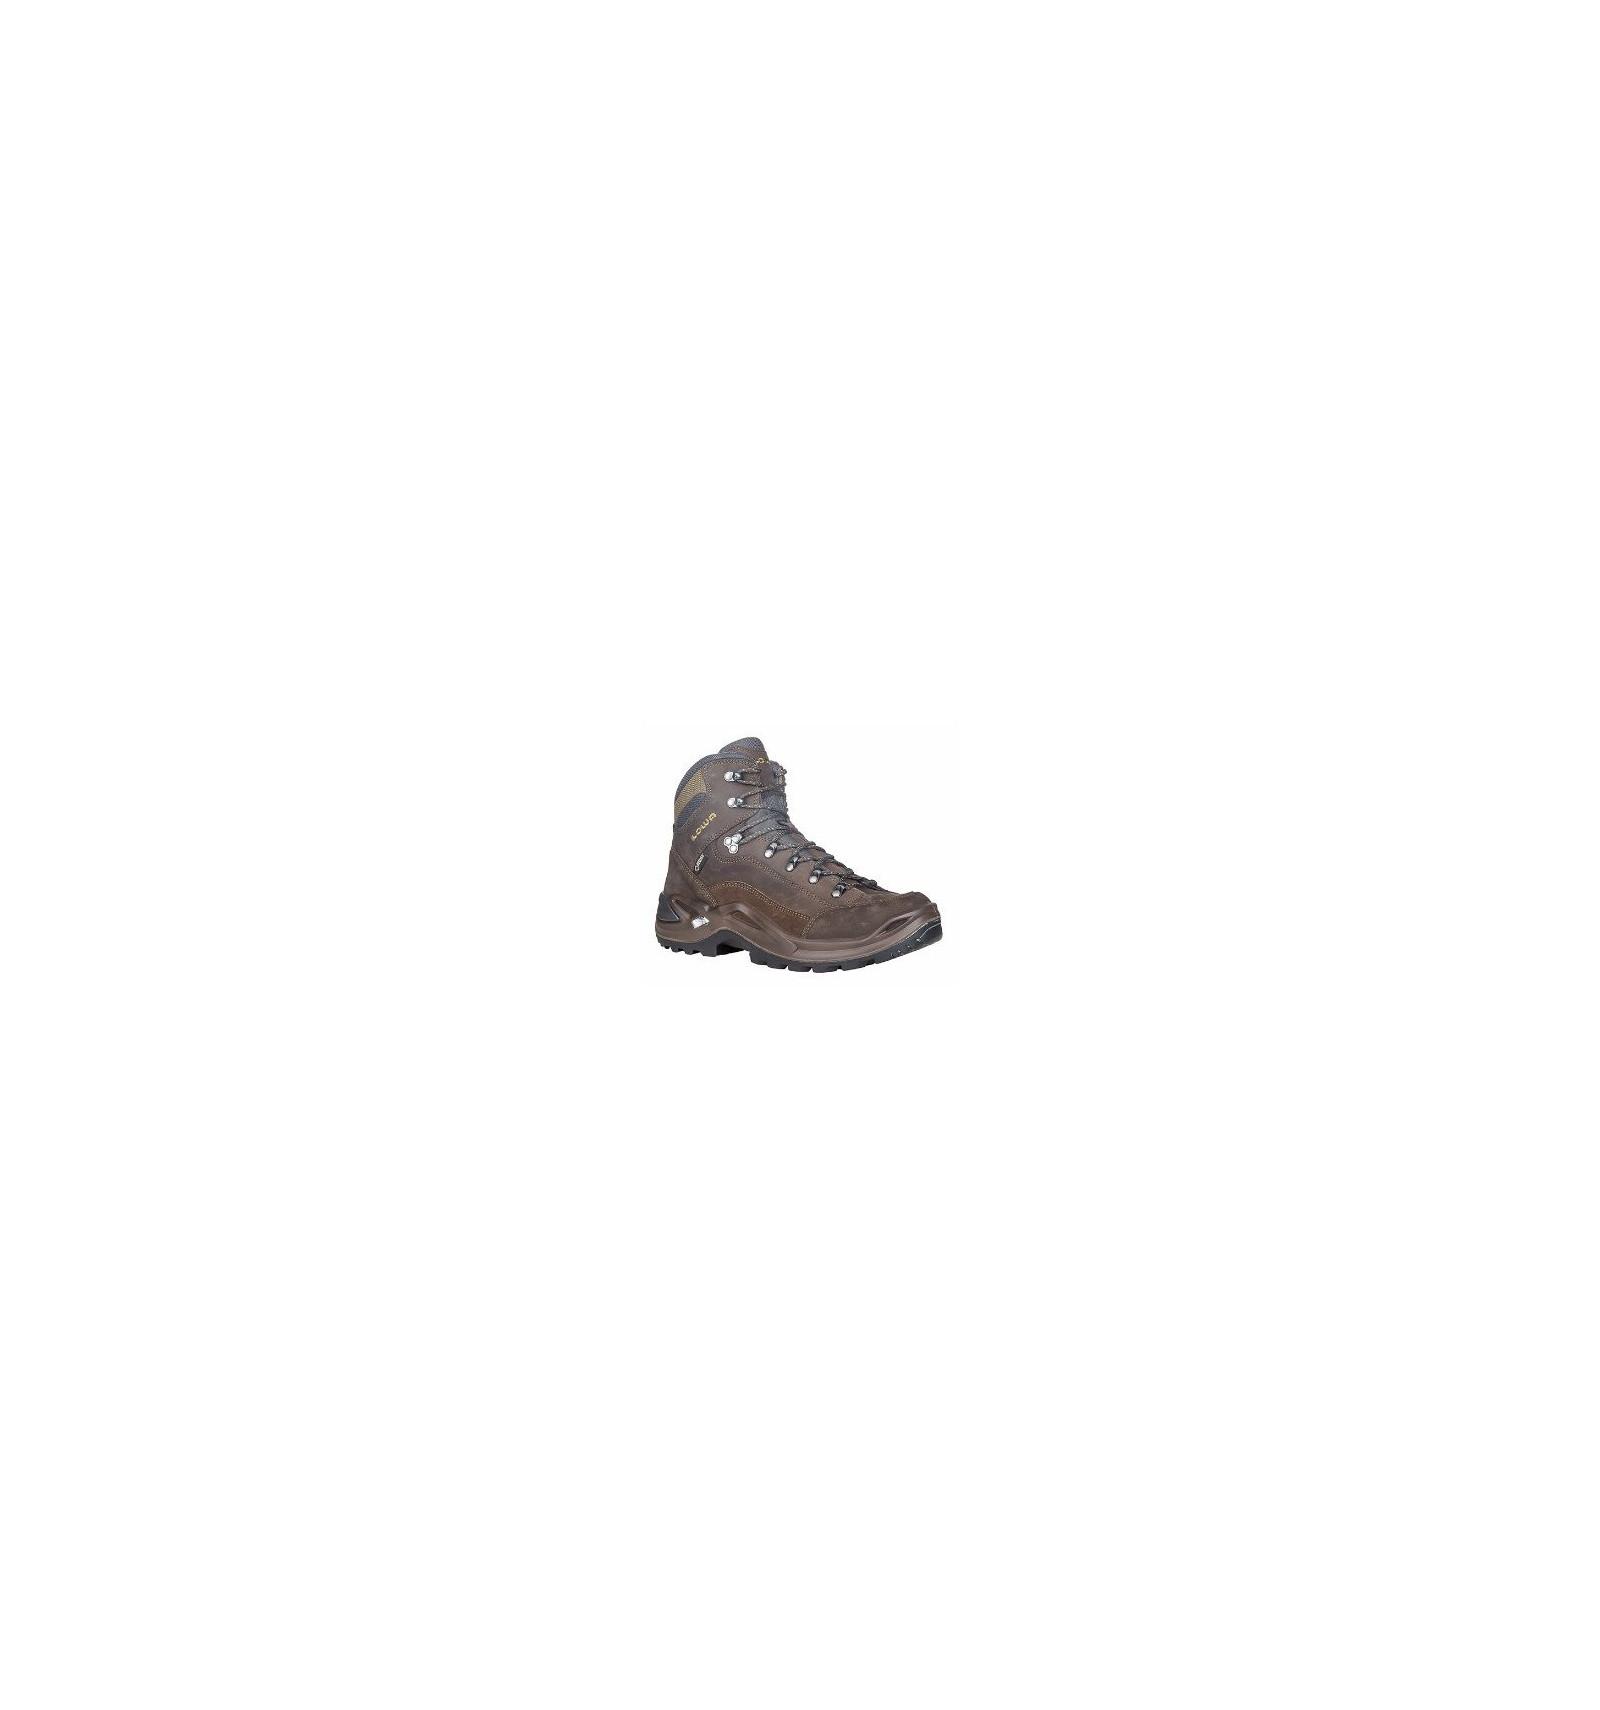 chaussure de randonn e renegade lowa gtx mid ardoise. Black Bedroom Furniture Sets. Home Design Ideas